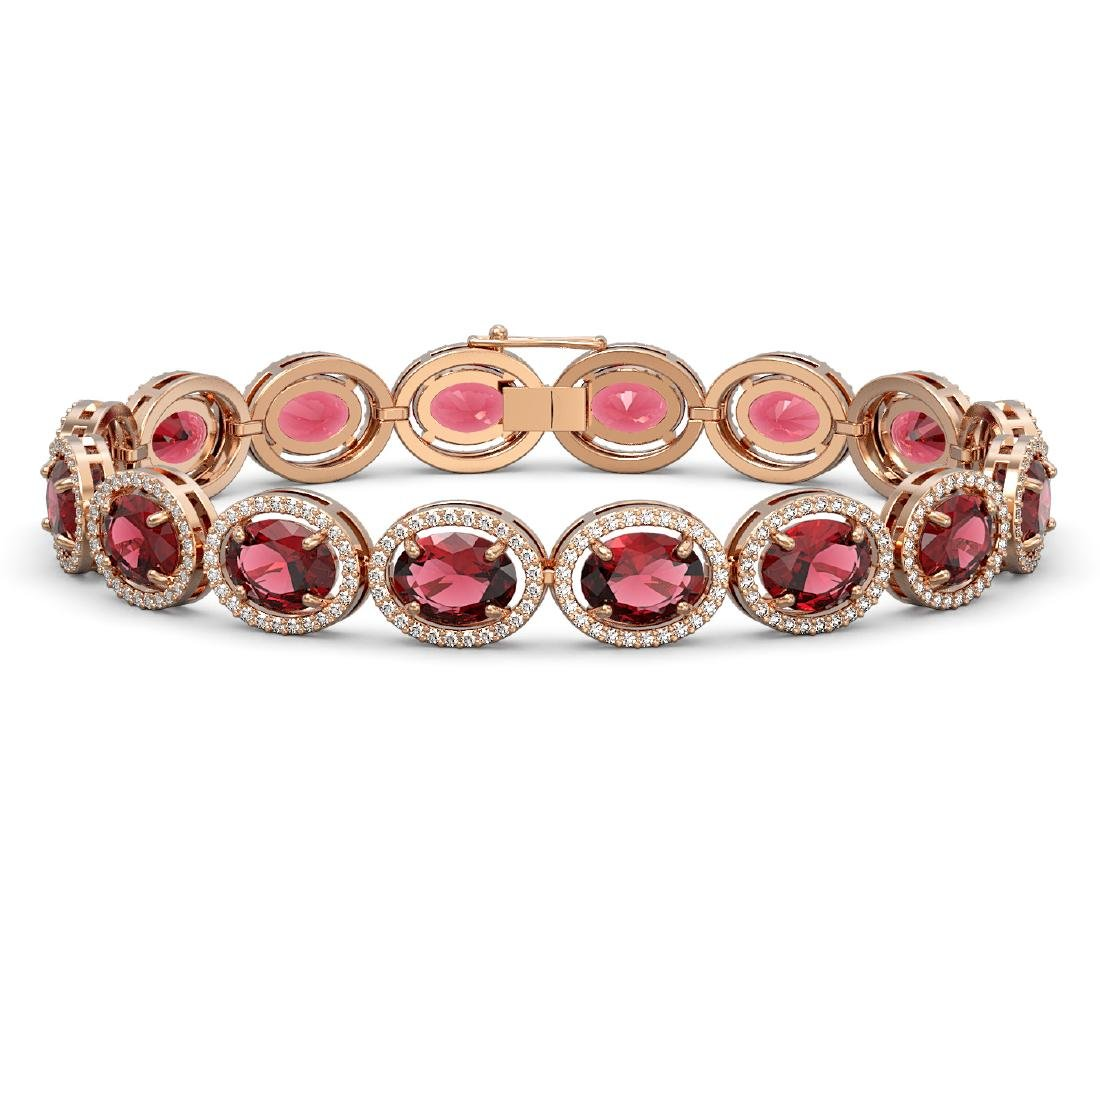 23.6 CTW Tourmaline & Diamond Halo Bracelet 10K Rose